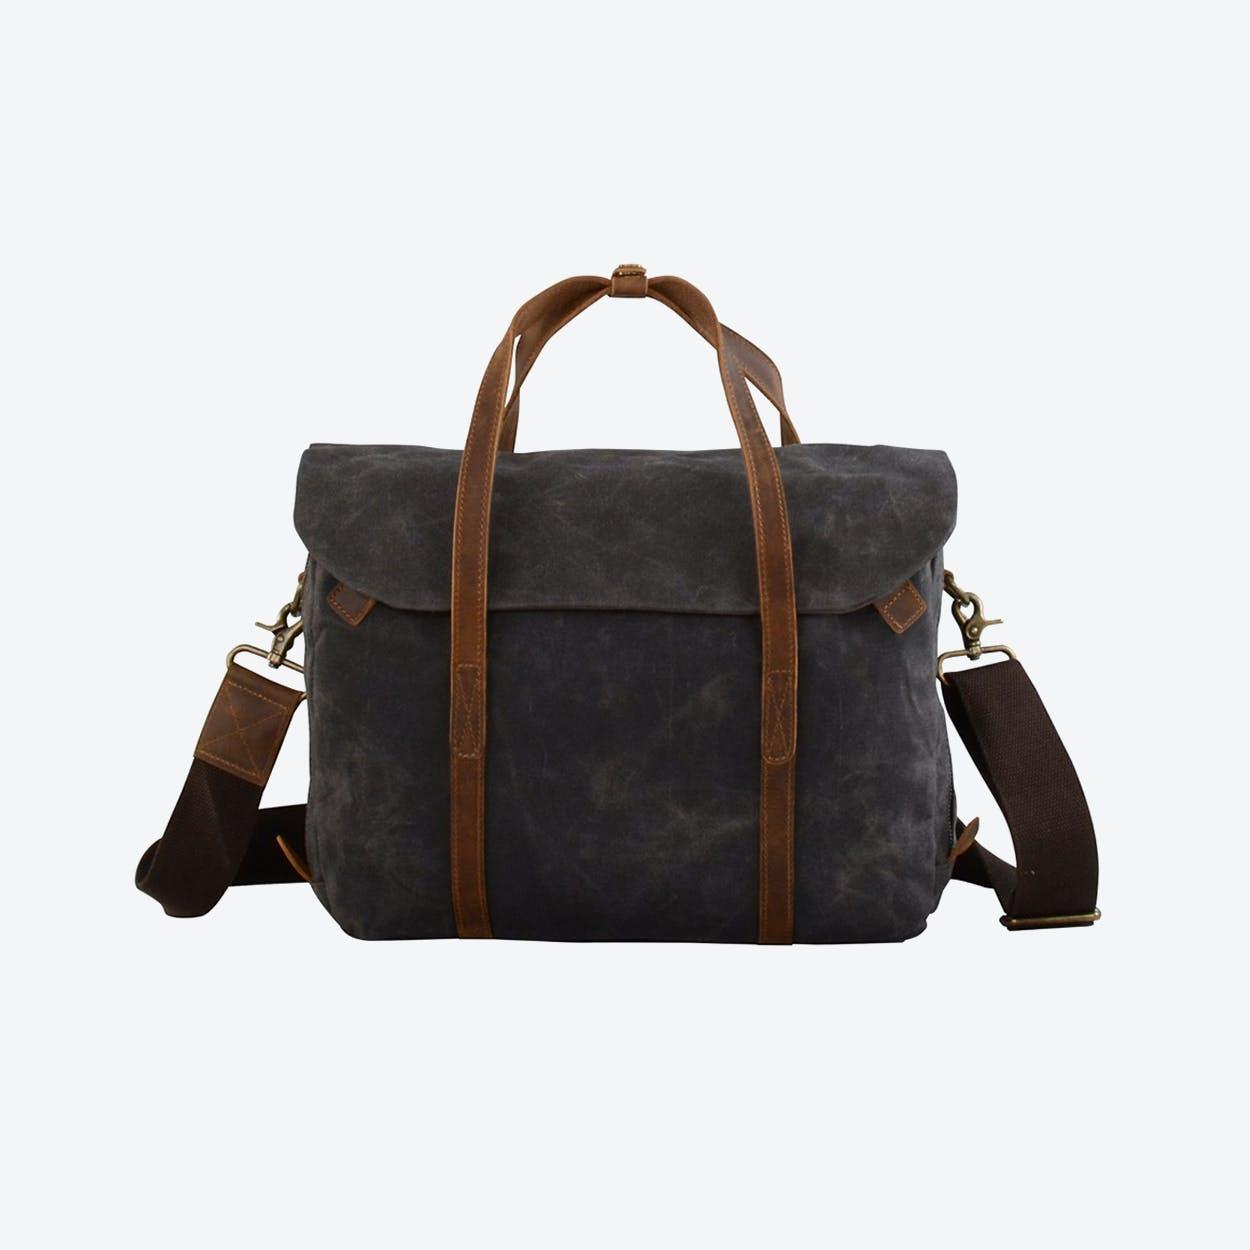 Waxed Canvas Cross Body Laptop Bag in Grey